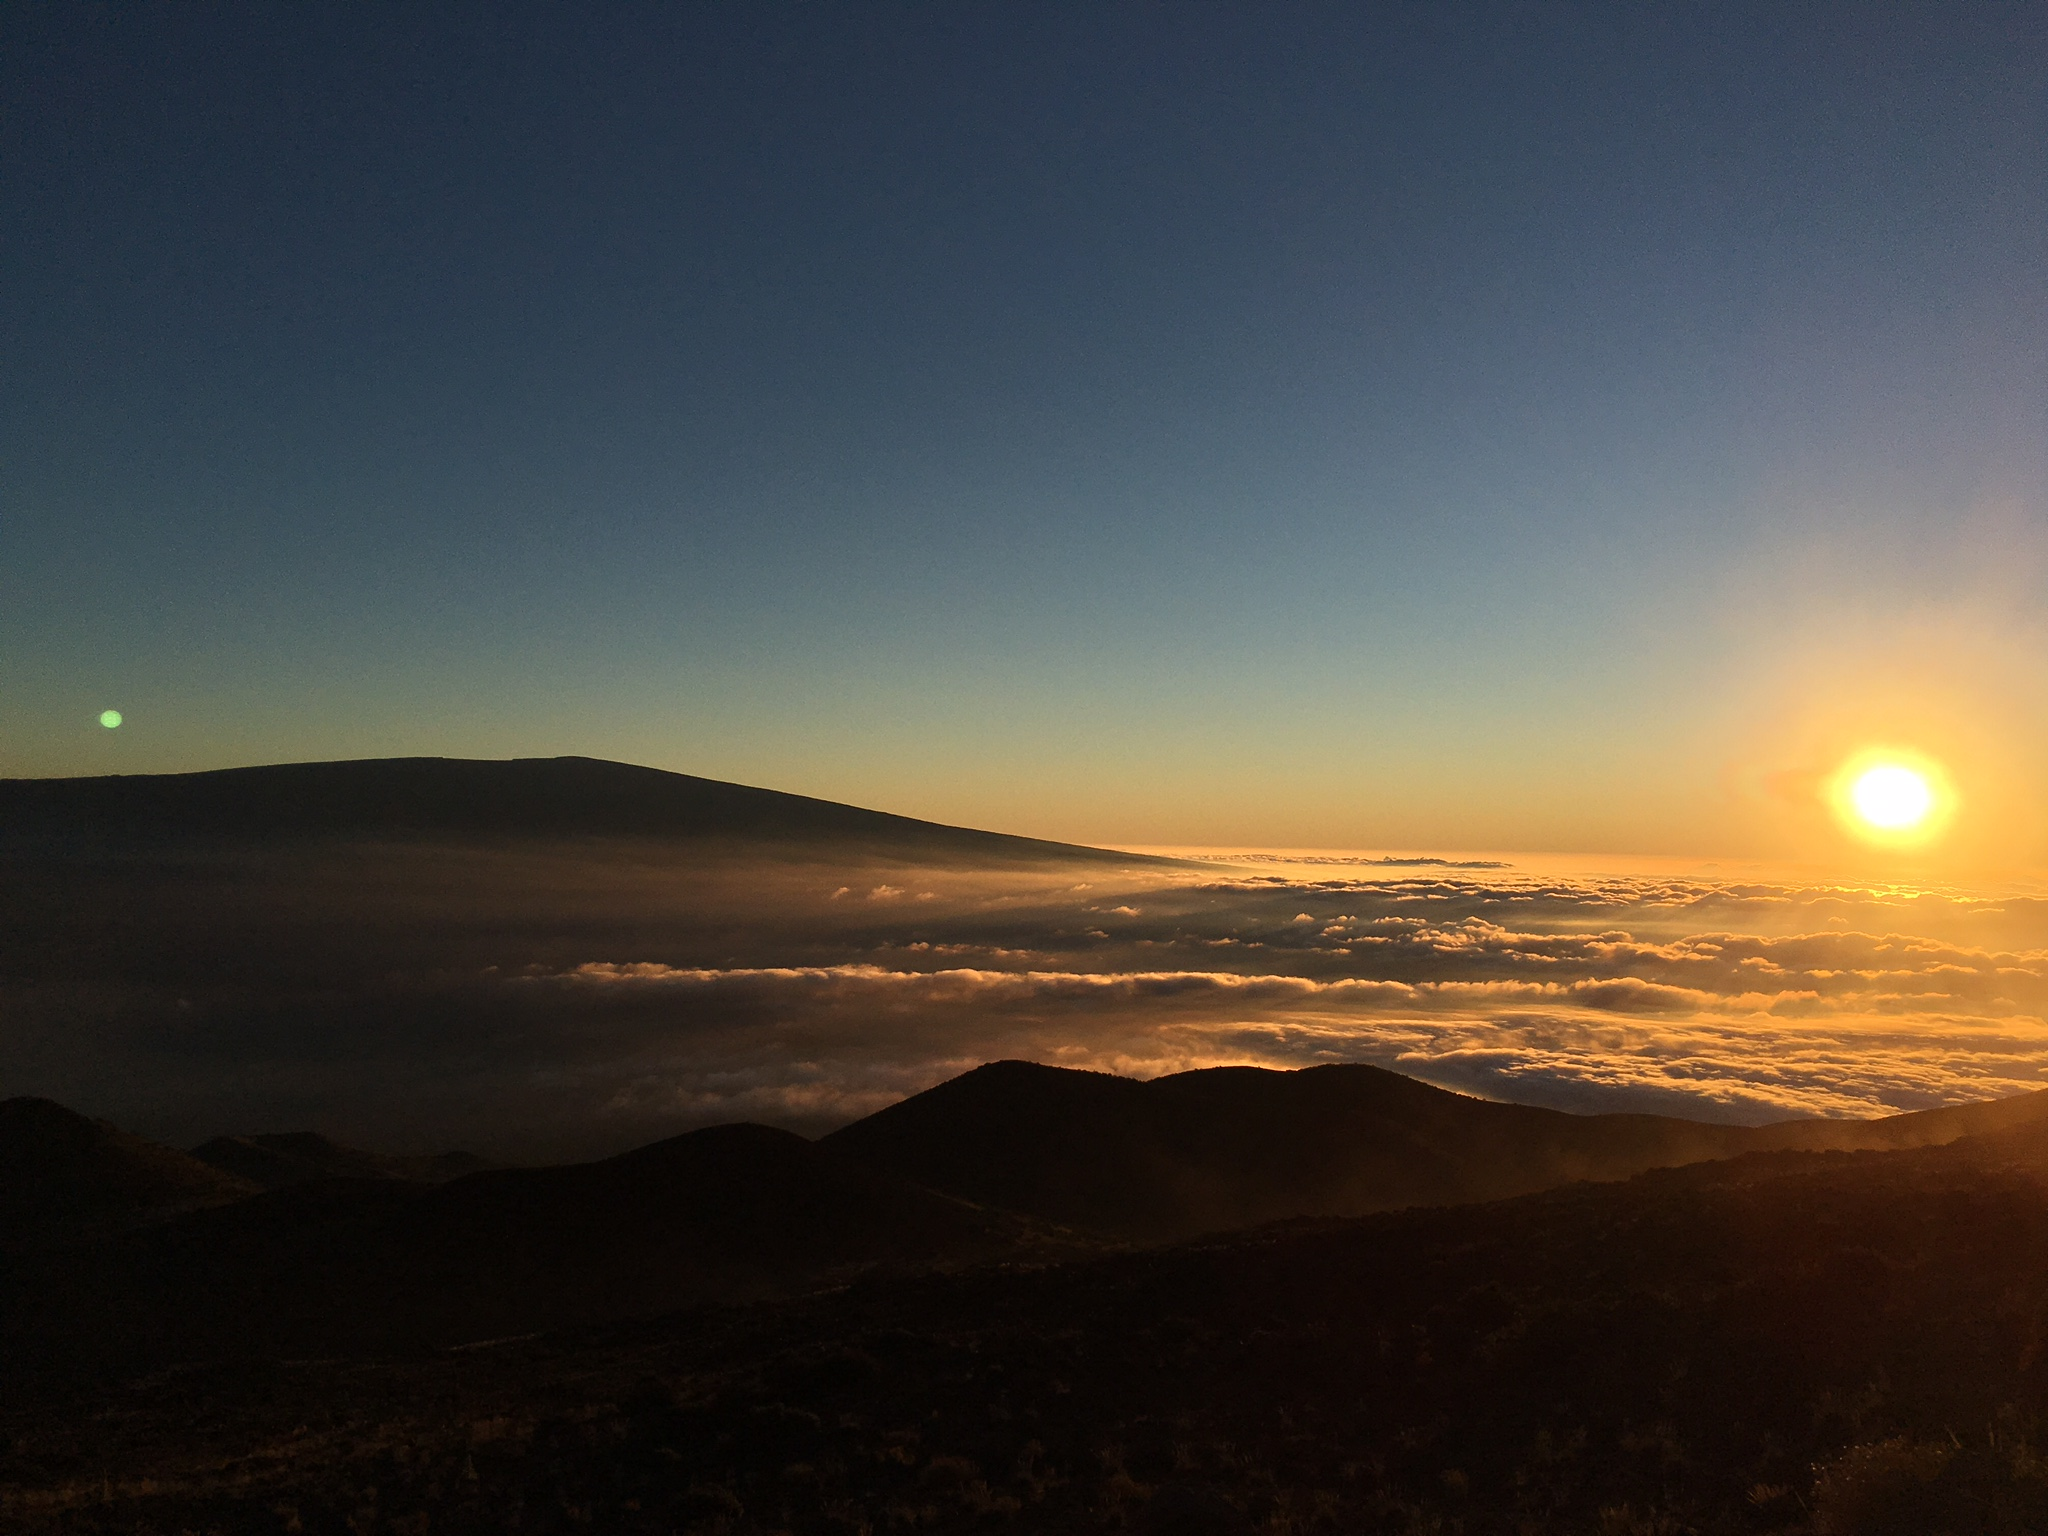 Above the clouds, sunset at Mauna Kea